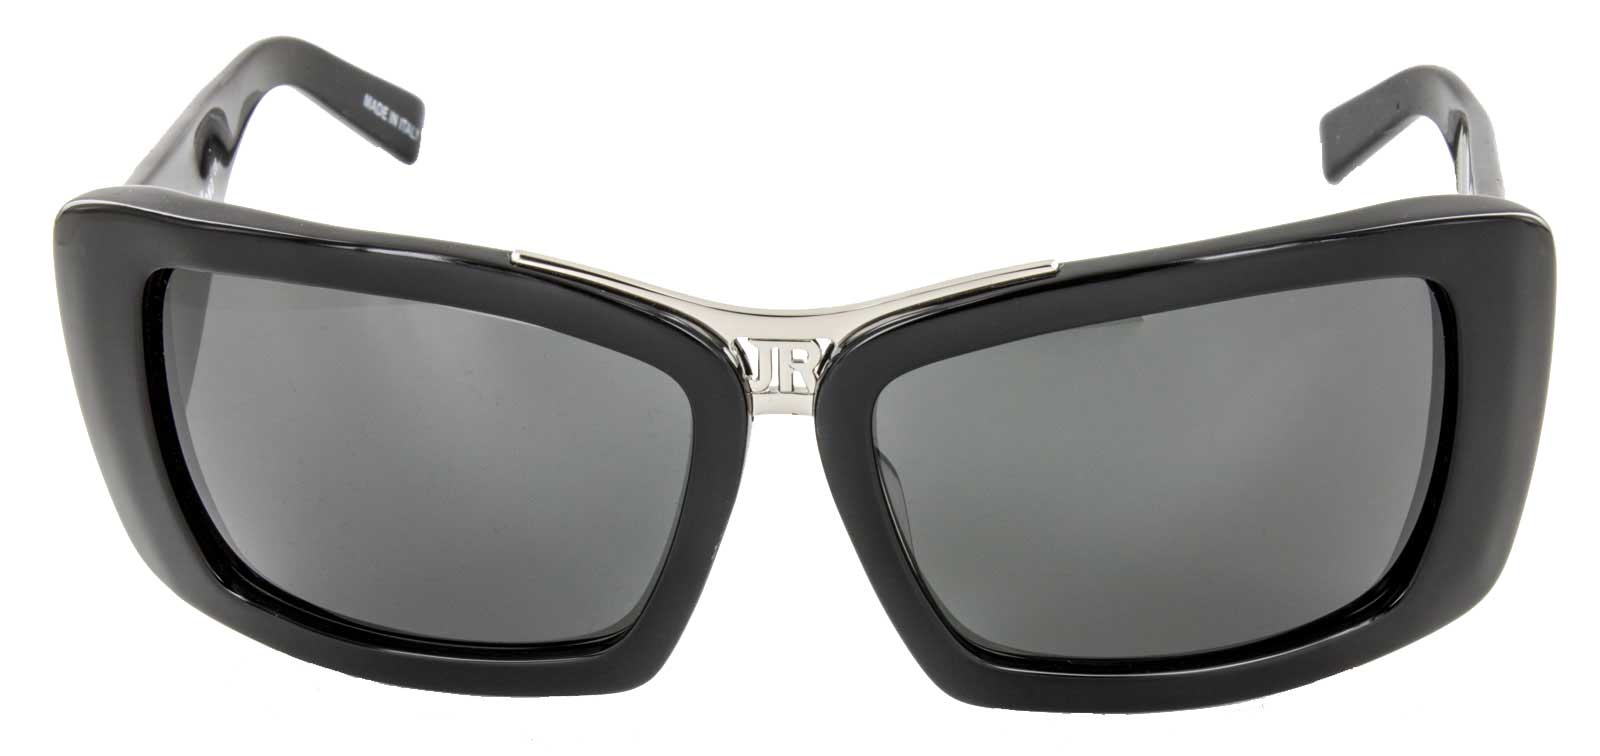 John Richmond Sonnenbrille JR60601 100% UV Schutz Vollrandbrille